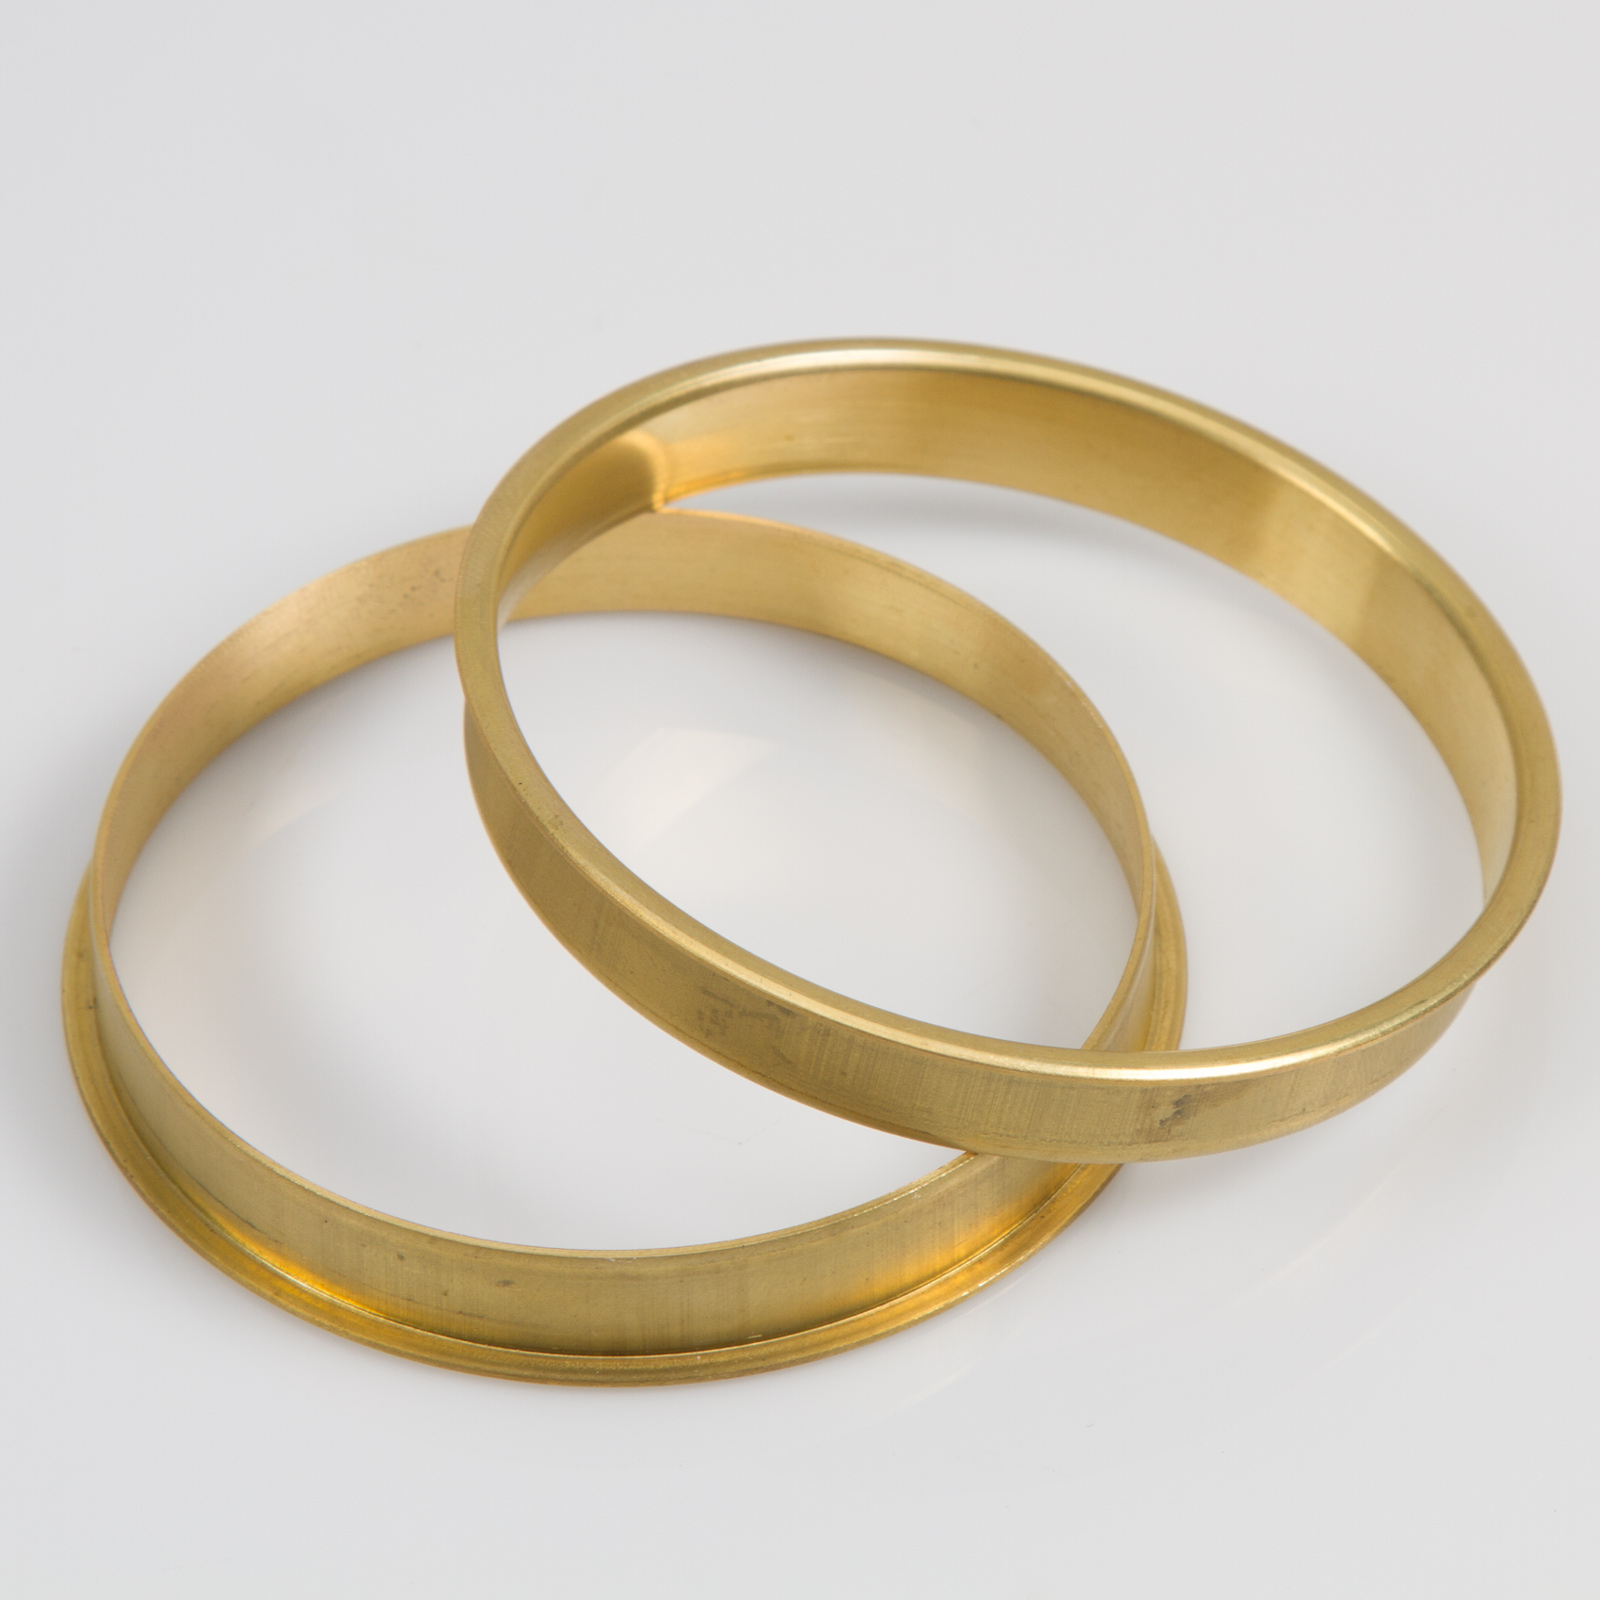 brass bangle bracelet kit size 8 at penn state industries